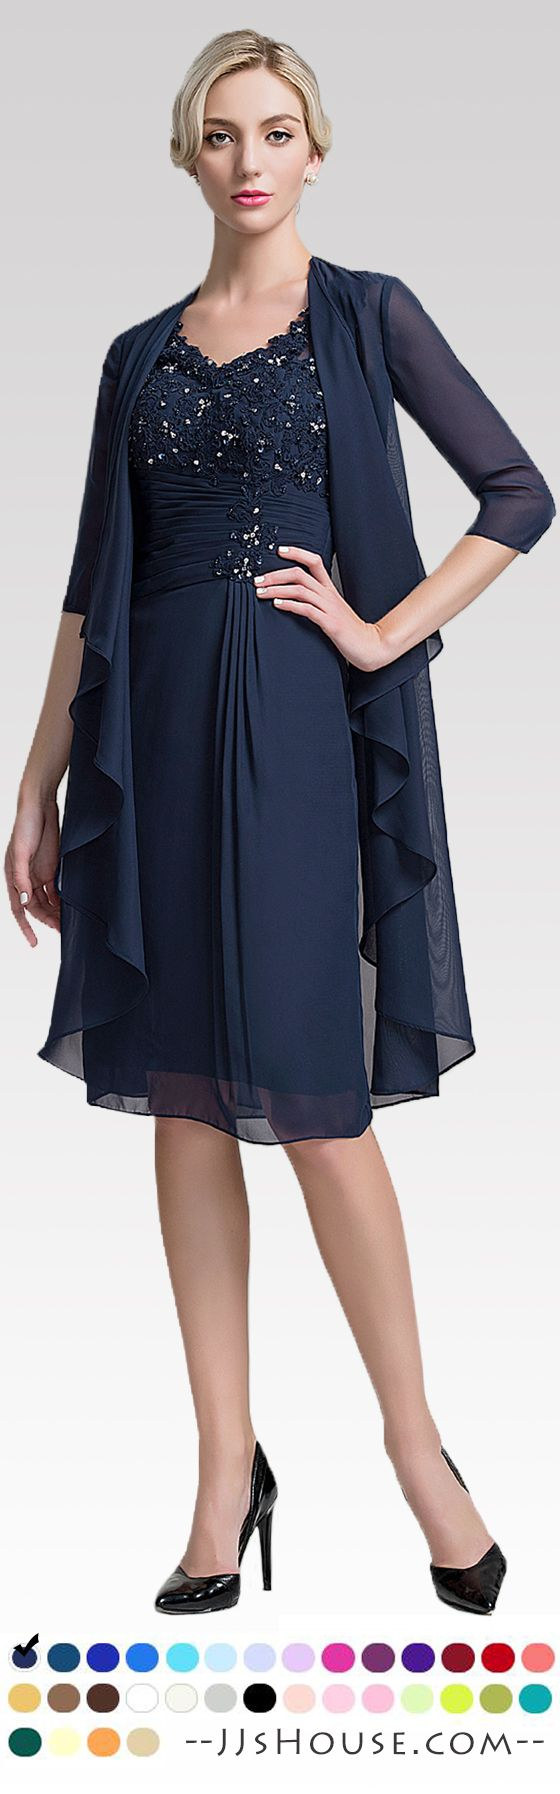 Sheath/Column V-neck Knee-Length Chiffon Mother of the Bride Dress With Ruffle Beading Sequins #JJsHouse